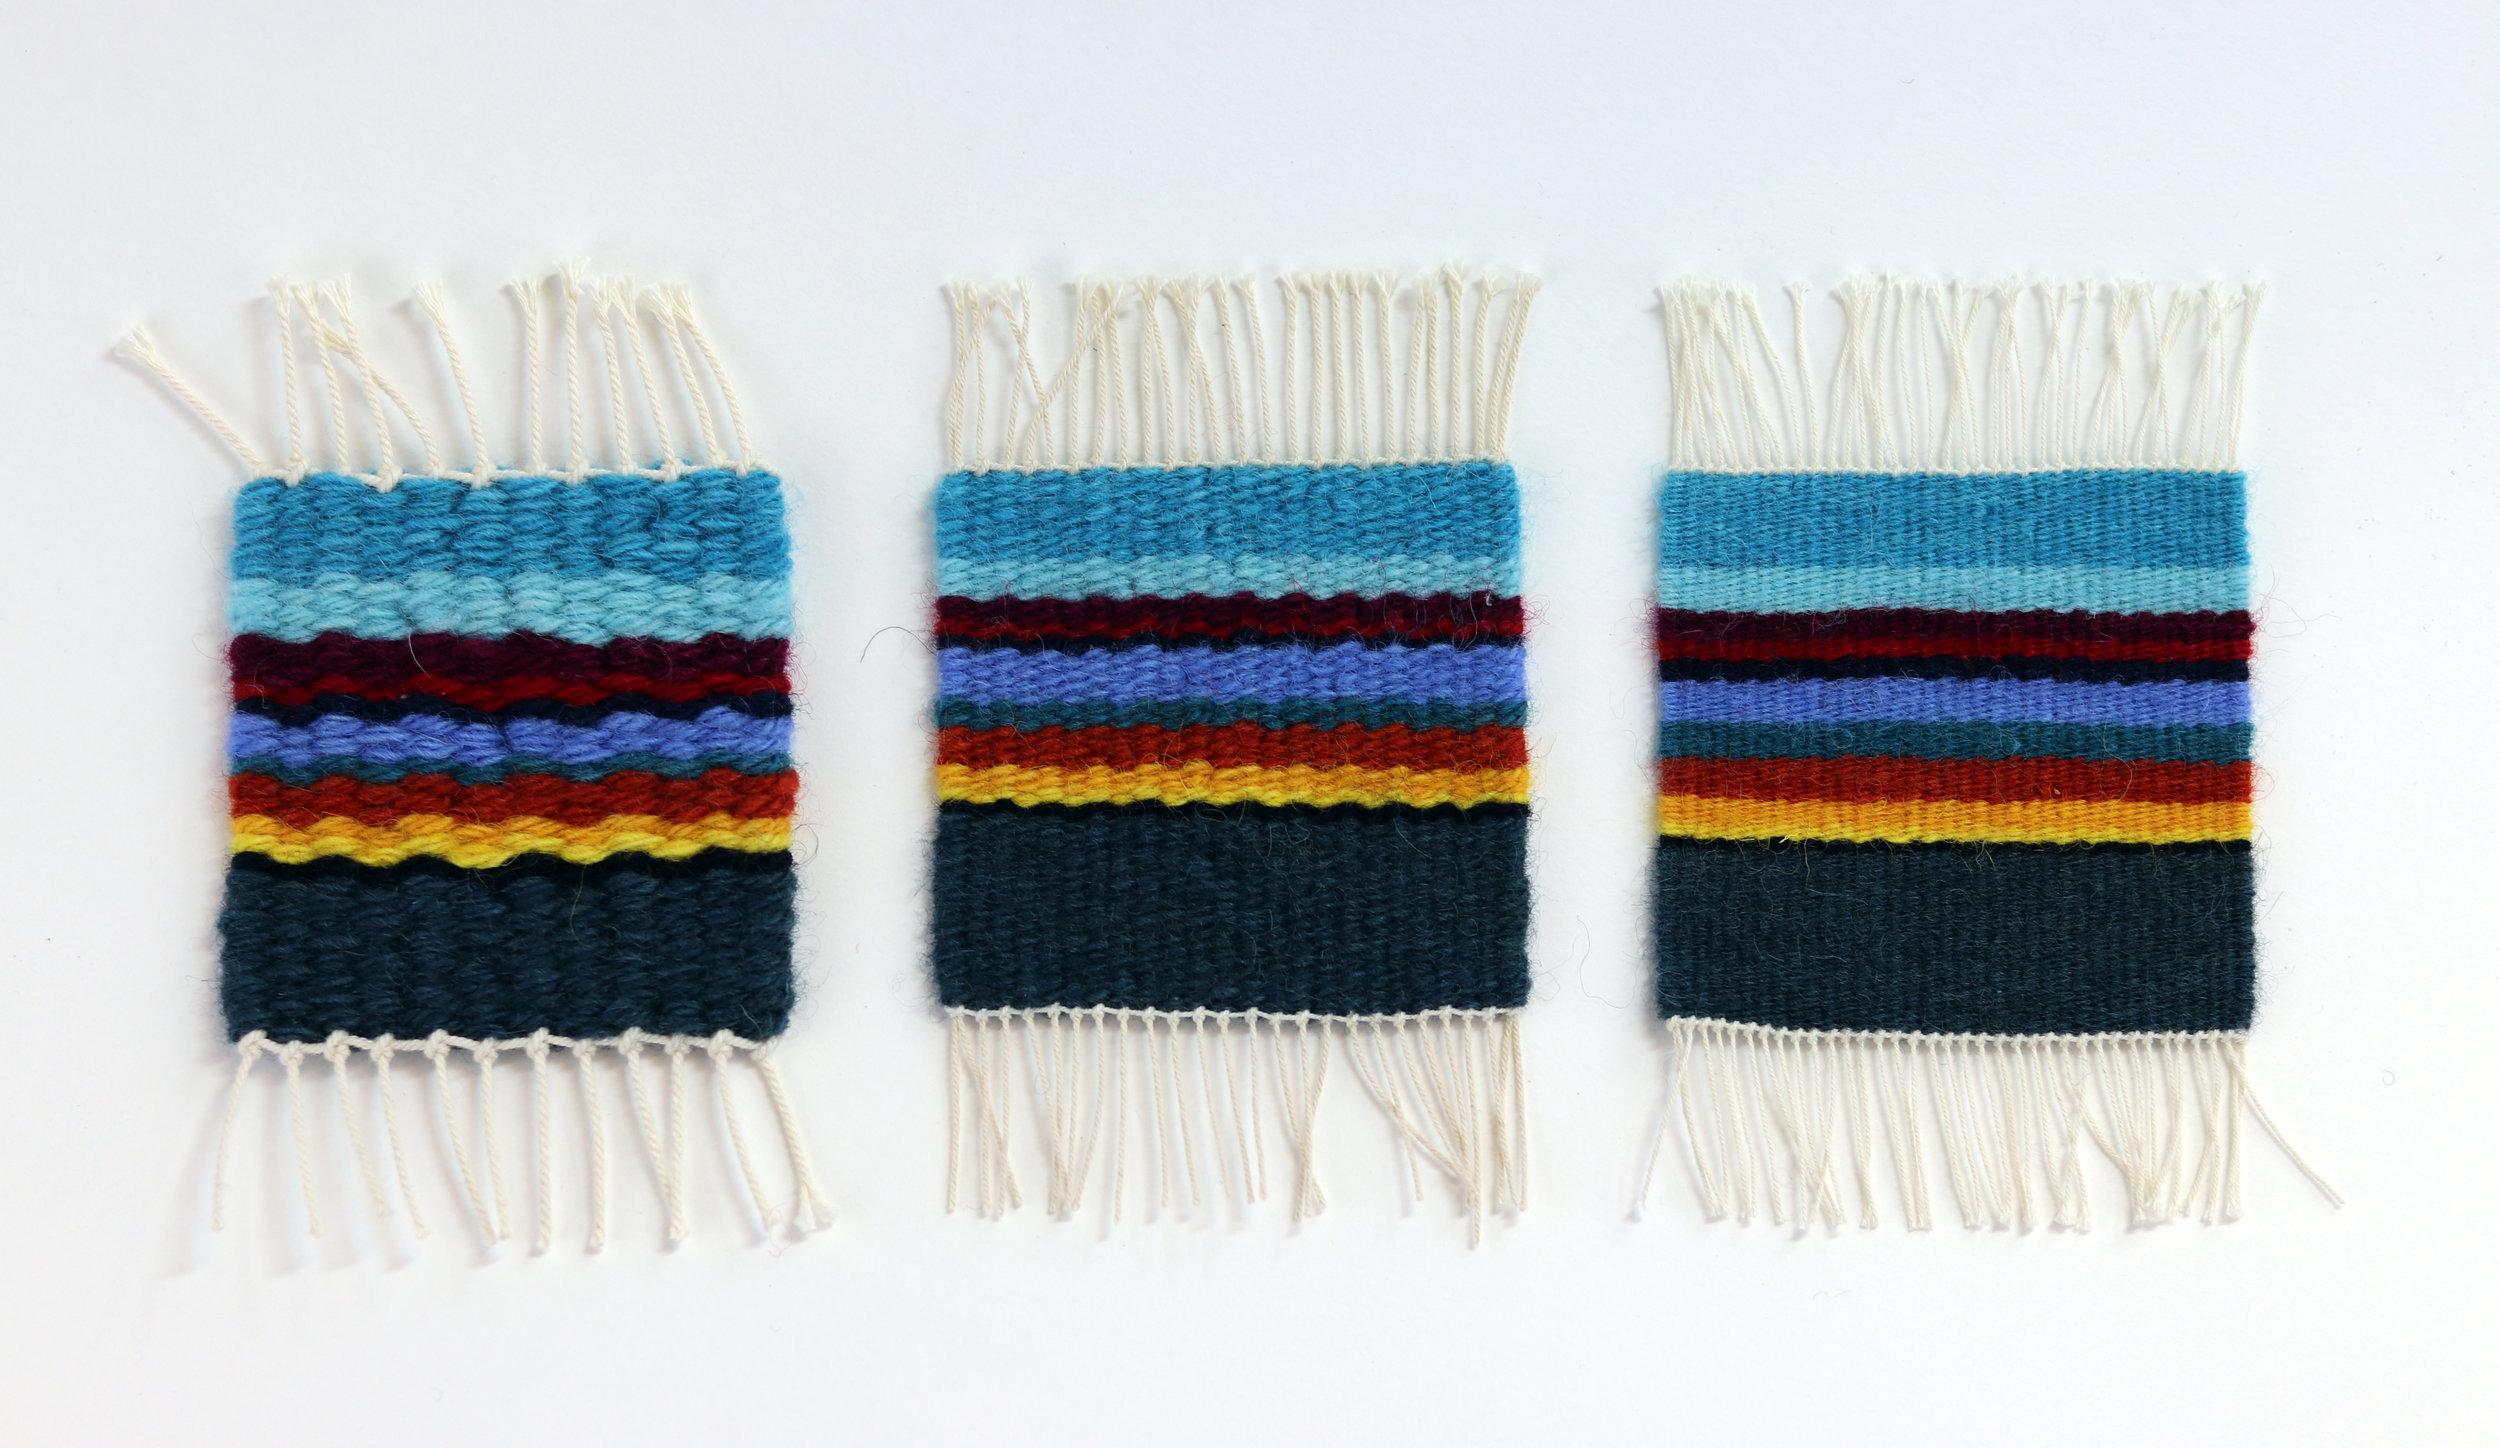 Tapestry sett examples. 4 epi, 8 epi, and 12 epi.